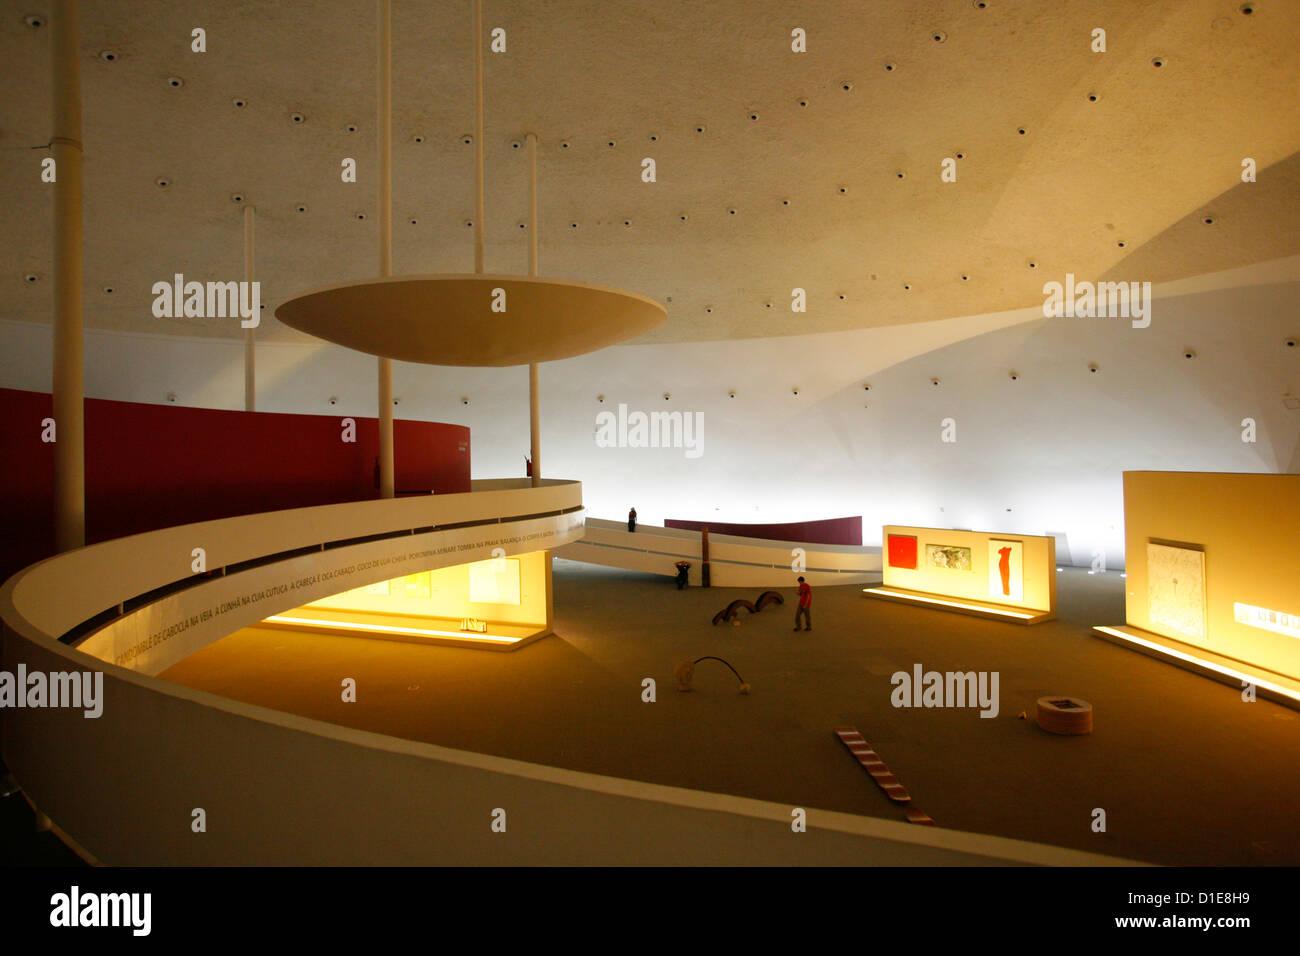 Museo Nacional (Nationalmuseum) entworfen von Oscar Niemeyer, Brasilia, UNESCO-Weltkulturerbe, Brasilien, Südamerika Stockbild